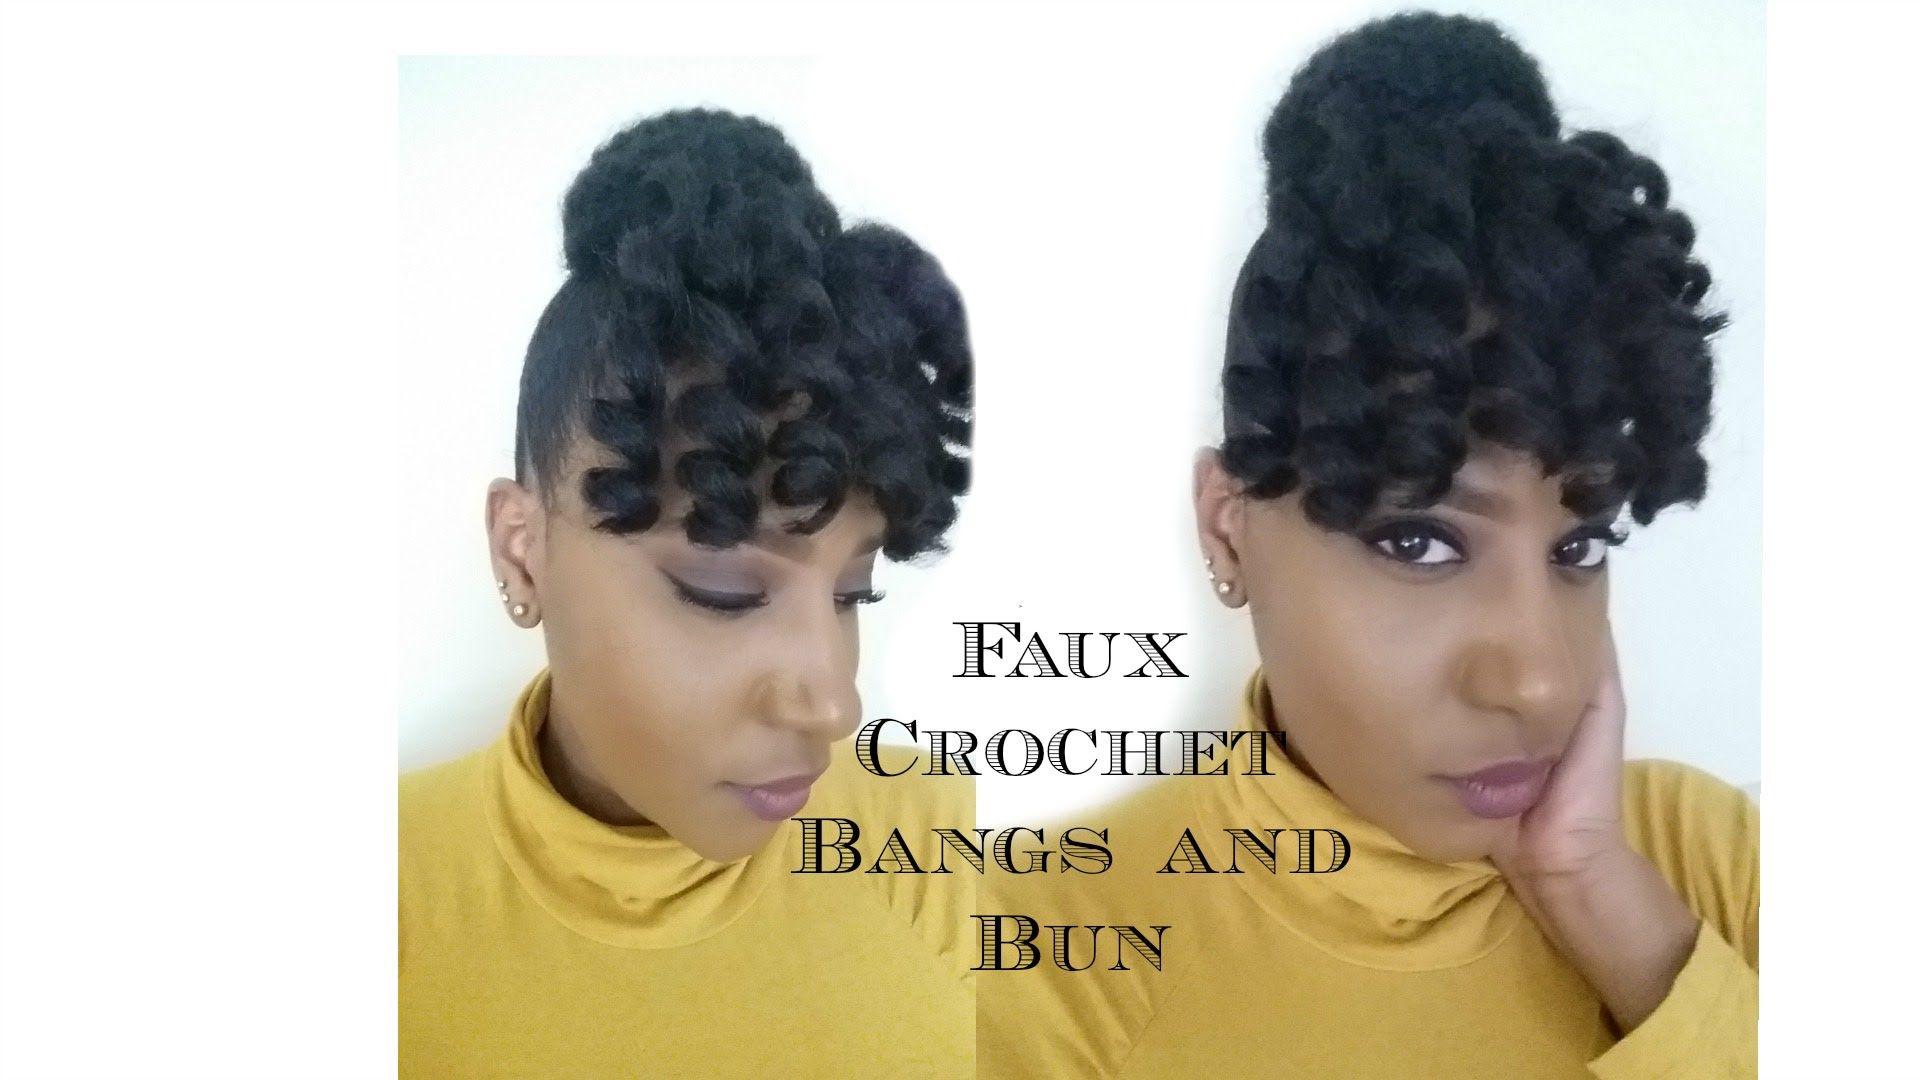 faux crochet bangs and bun| jamaican bounce and marley hair